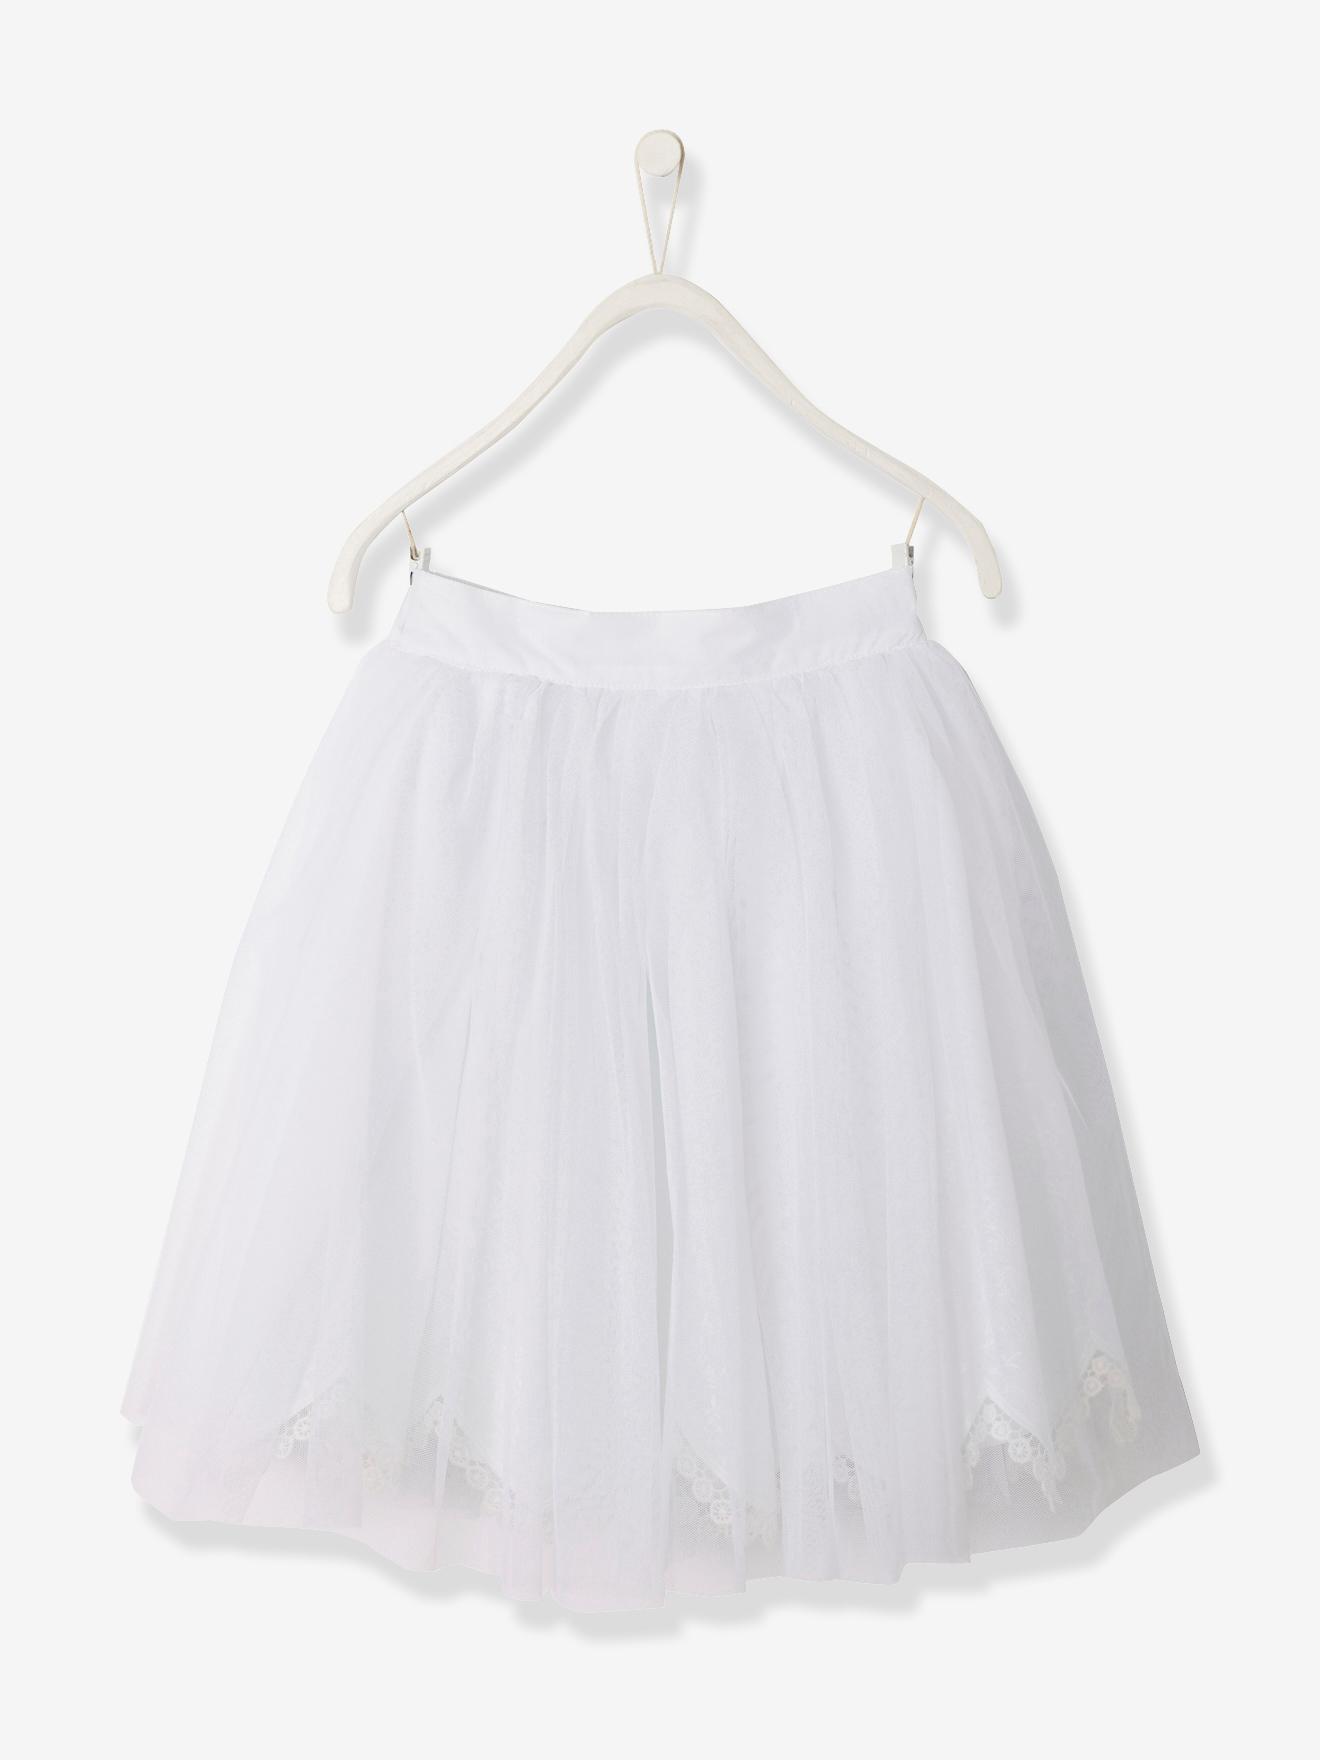 dd52b2e72a3 Tylnederdel Vertbaudet Kjoler & nederdele til Børn i Hvid